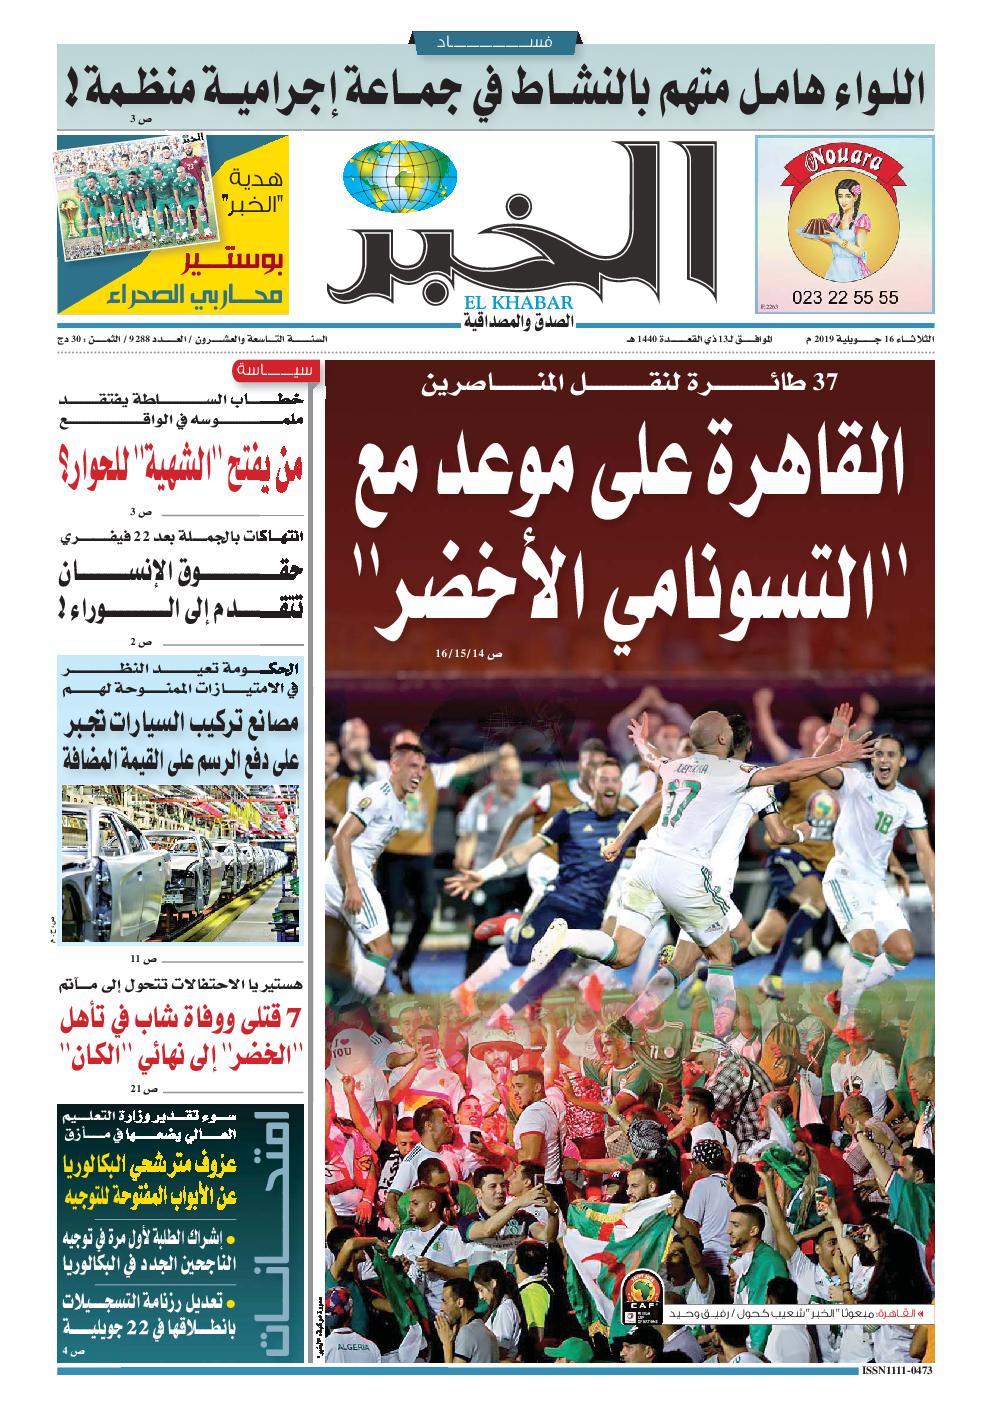 El Chourouk Journal Algerien Pdf